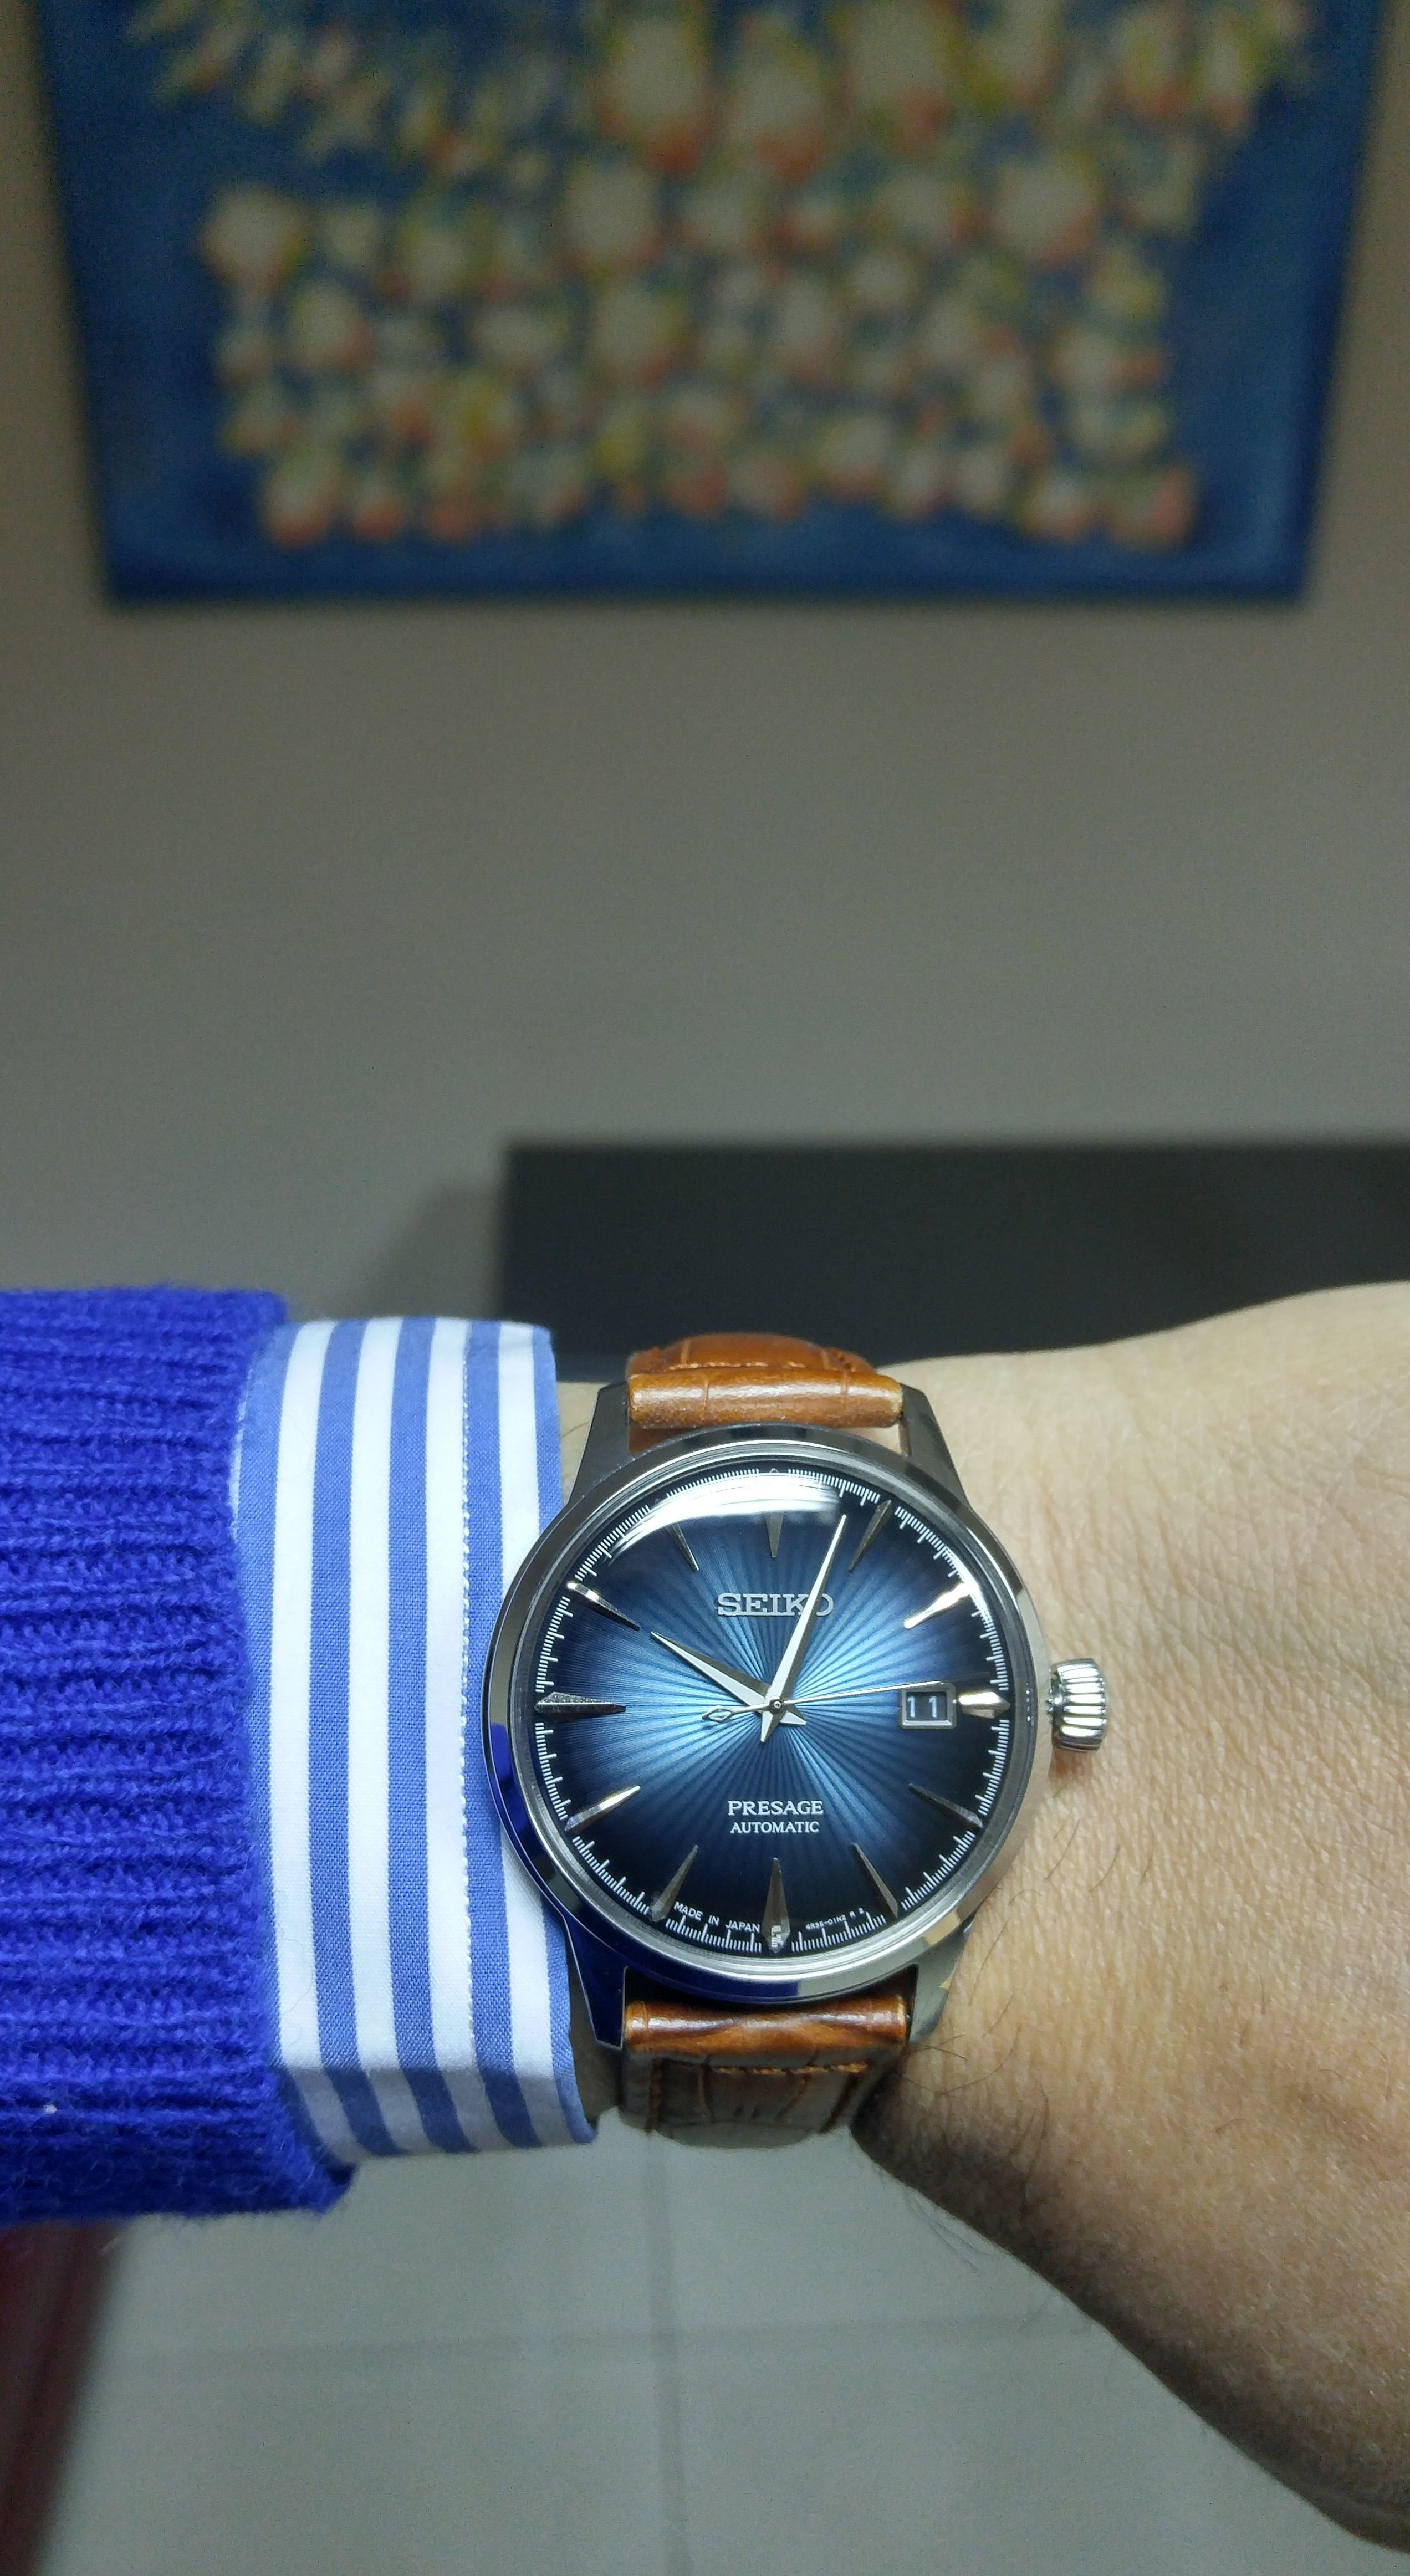 87b3ef691 Seiko SRPB41 Seiko Presage, Seiko Watches, Breitling, Fashion, Omega Watch,  Clocks